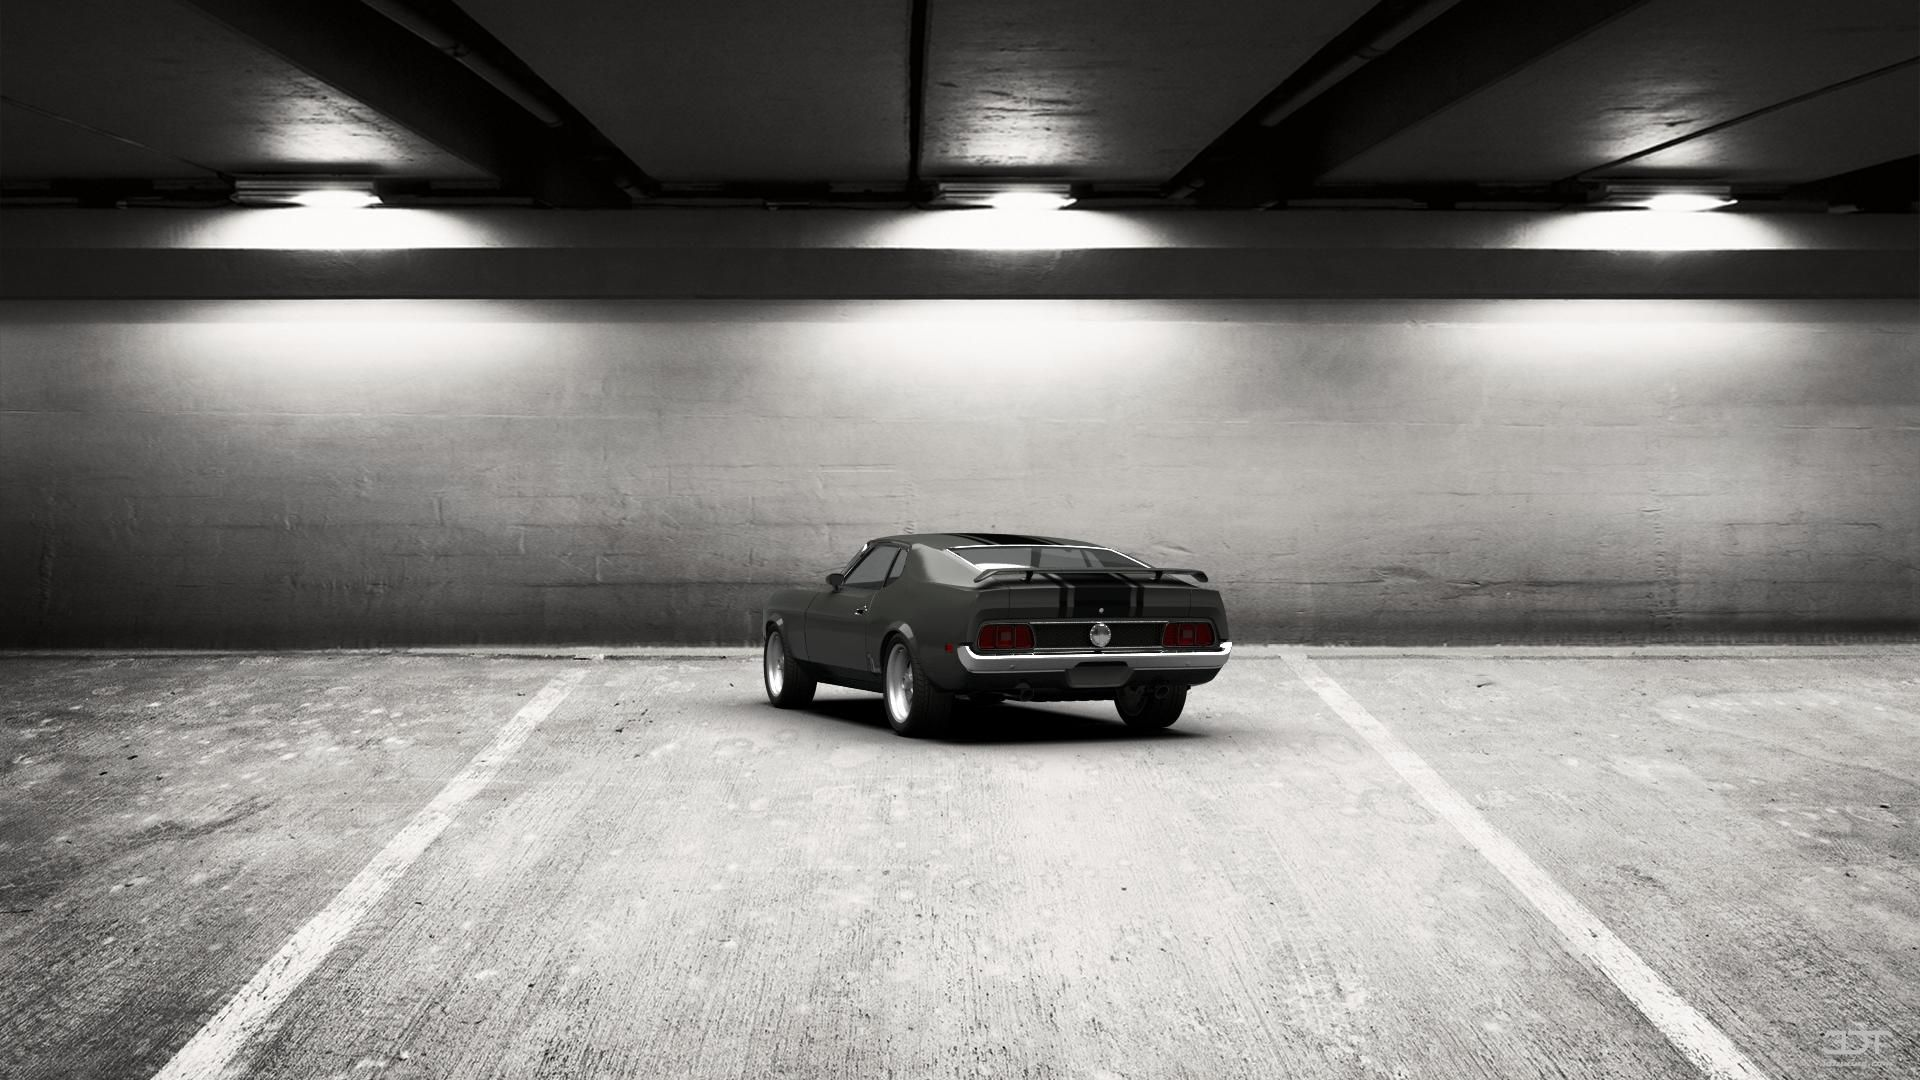 Checkout my tuning #Mustang #Mach1 1971 at 3DTuning #3dtuning #tuning